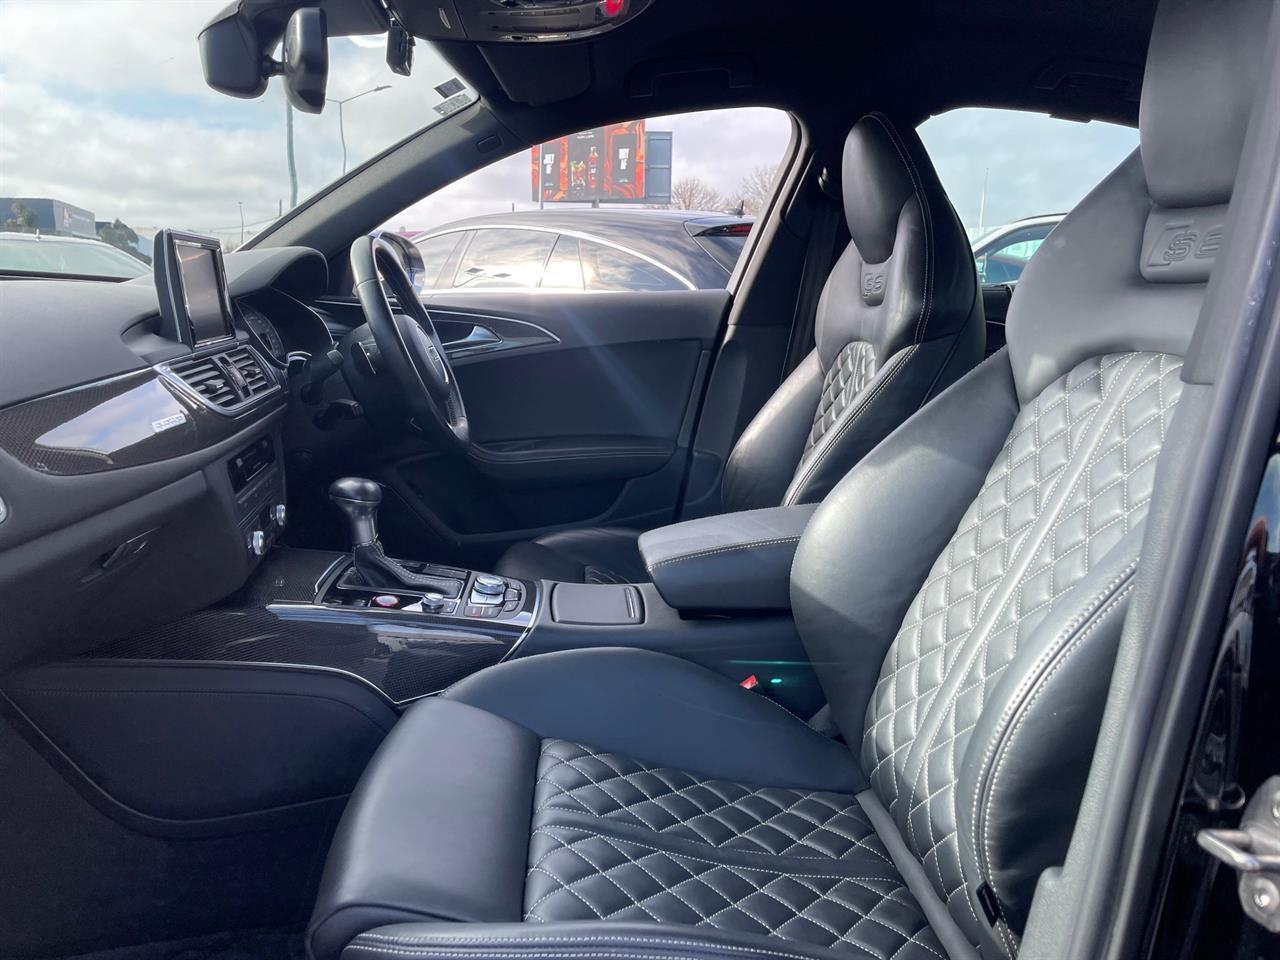 image-6, 2013 Audi S6 4.0 V8 TFSI Quattro Sedan at Christchurch